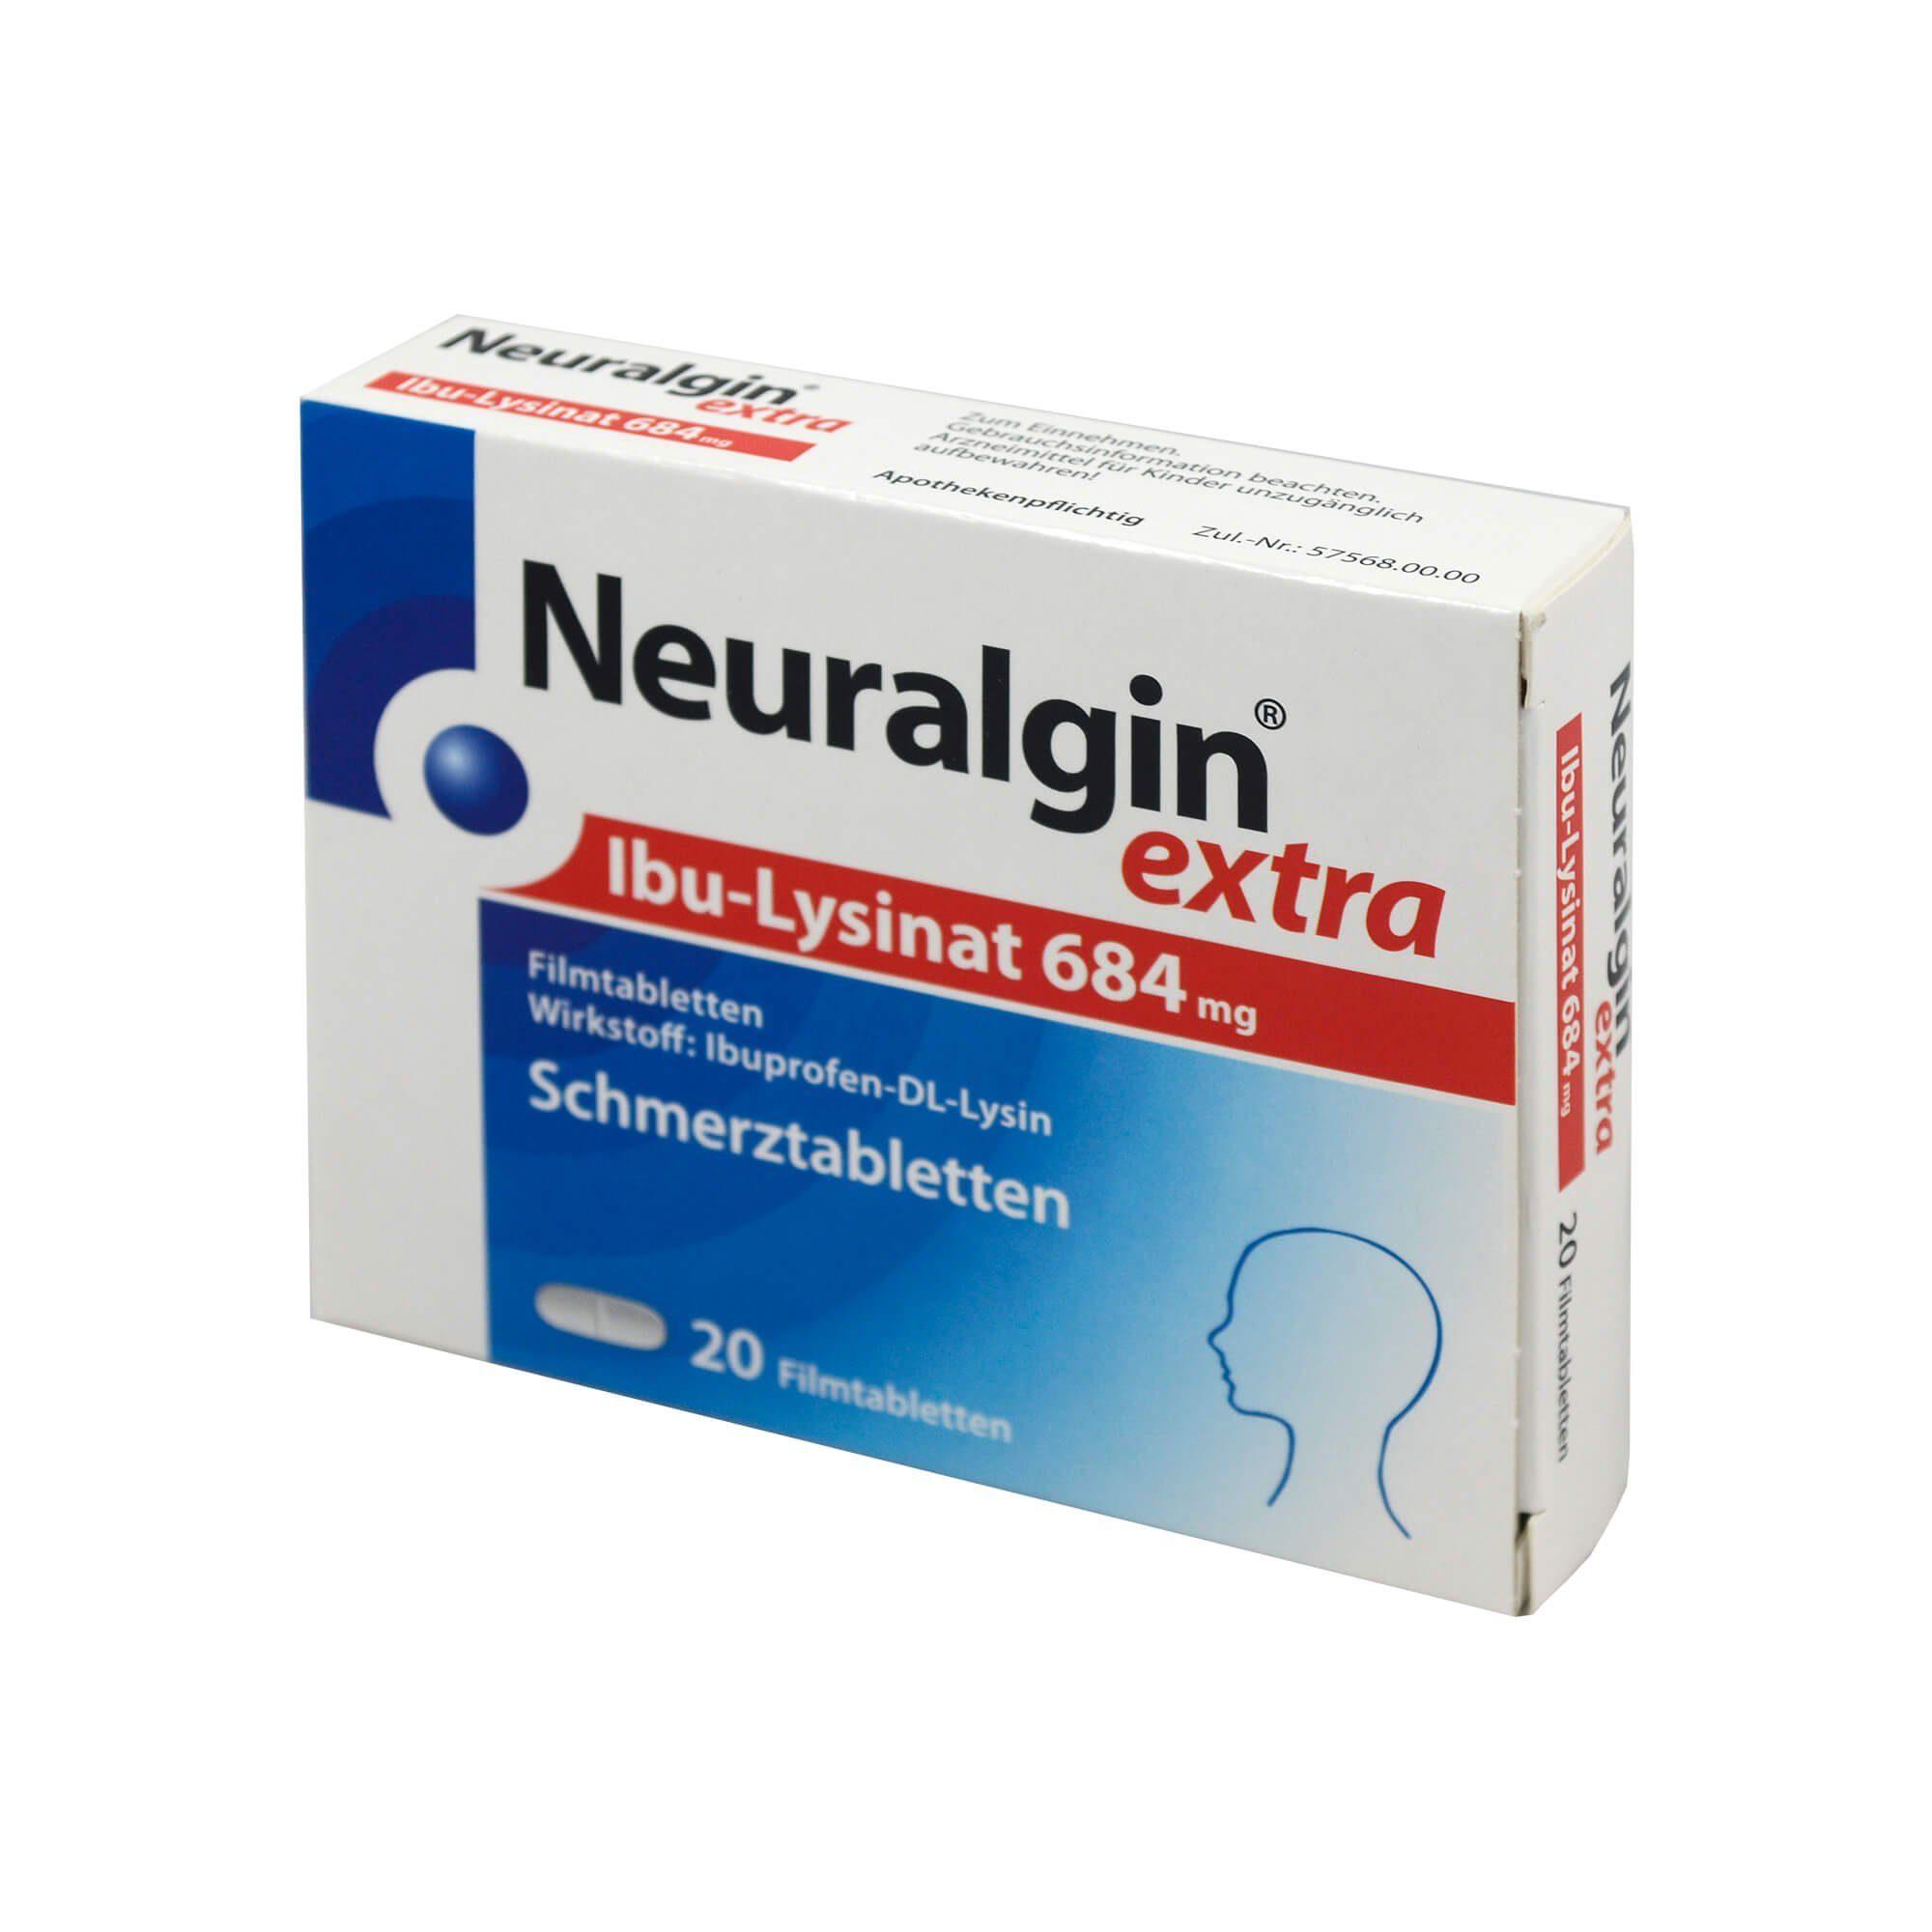 Neuralgin Extra IBU-Lysinat Filmtabletten , 20 St